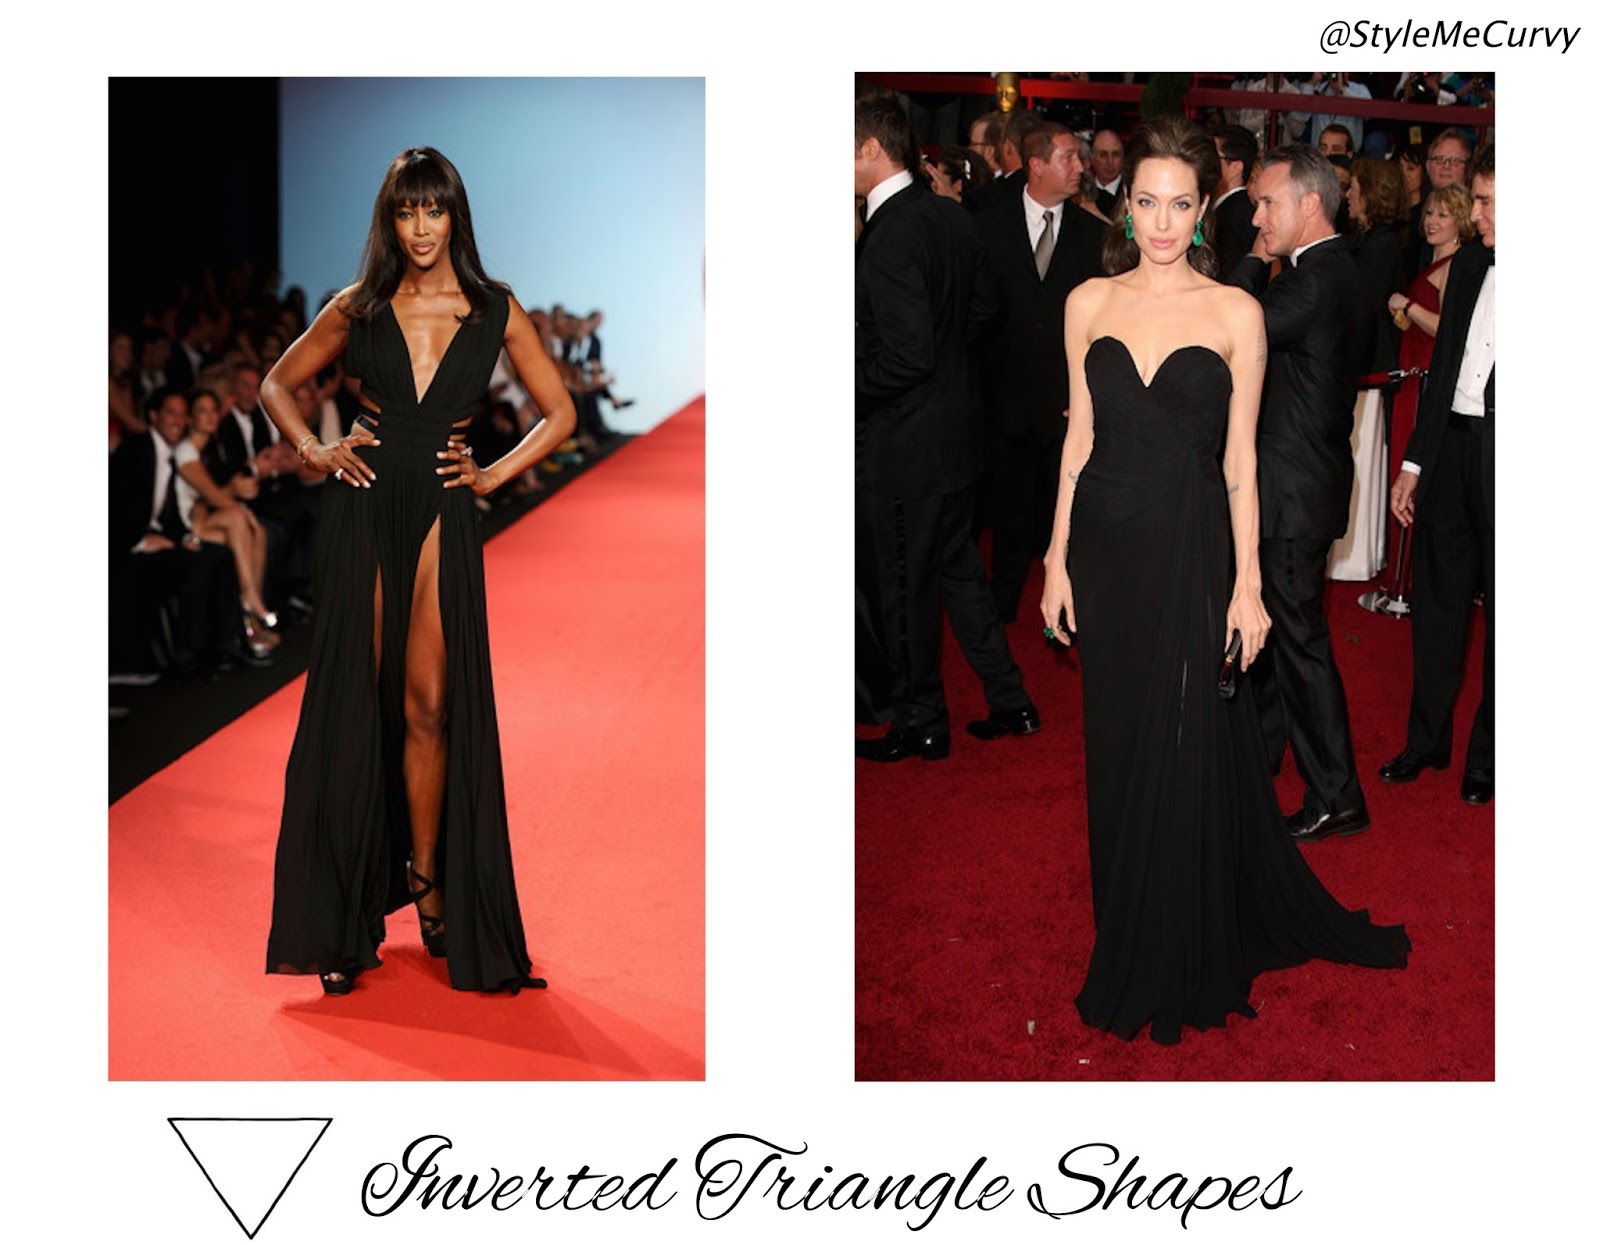 Triangle Shapes Naomi Campbell and Angelina Jolie